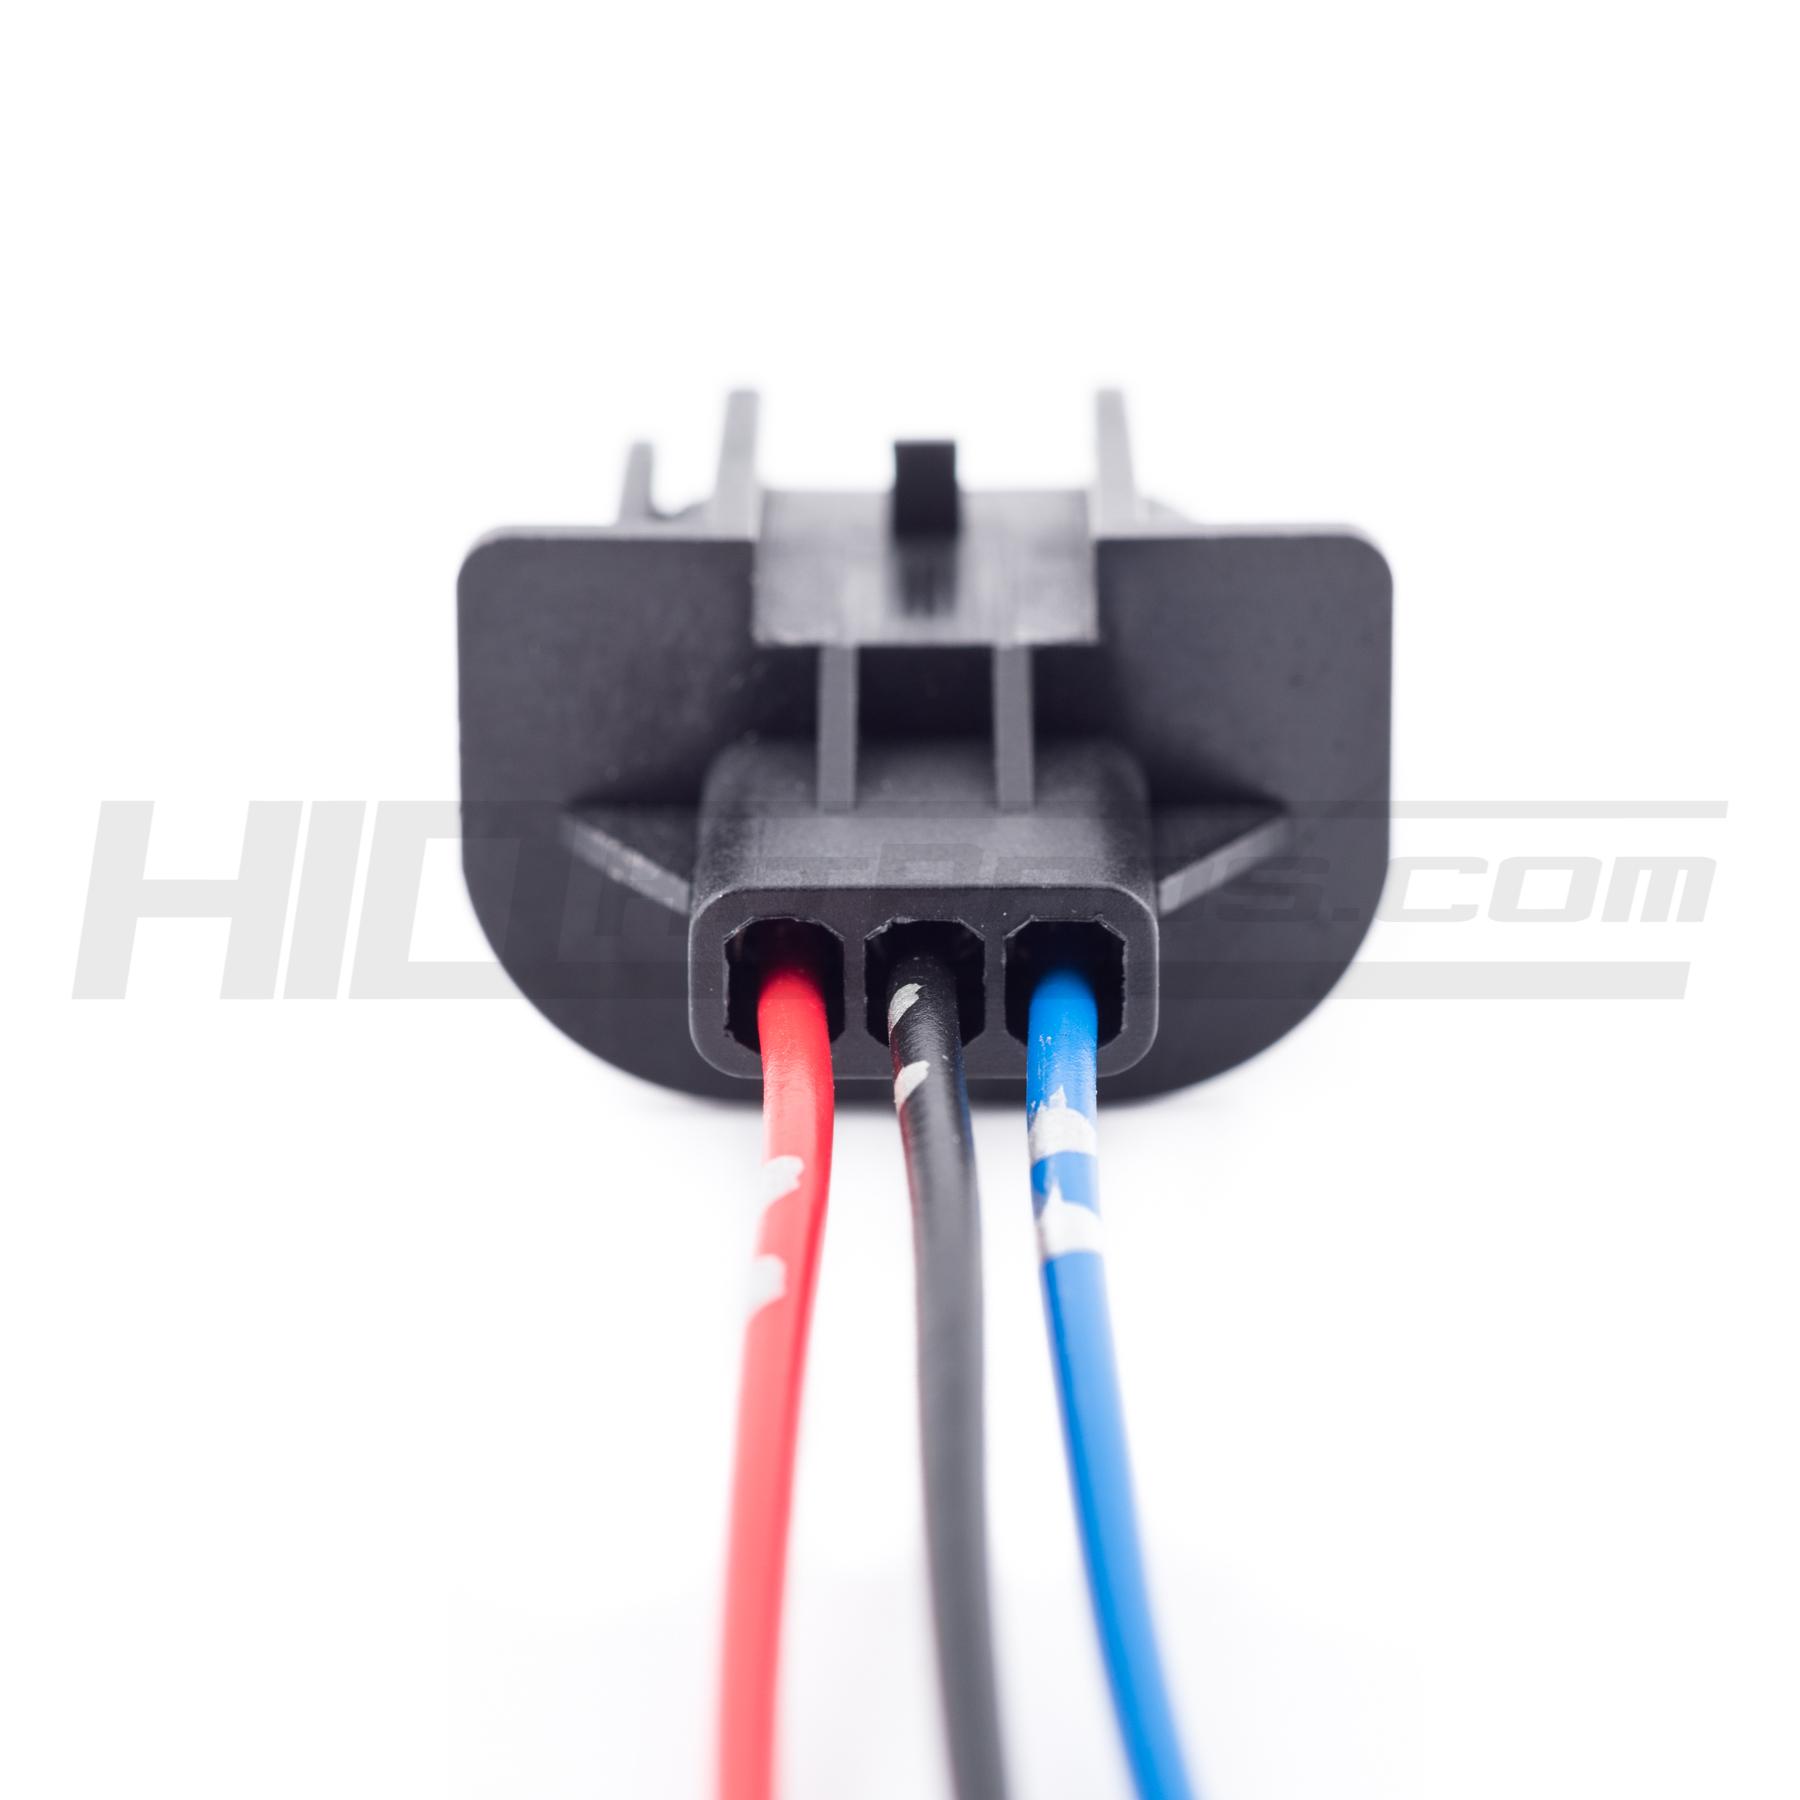 H13/9008 Headlight Wiring Socket Adapter - Male & on hid kit headlight harness, h13 hid wiring, h13 plug harness,